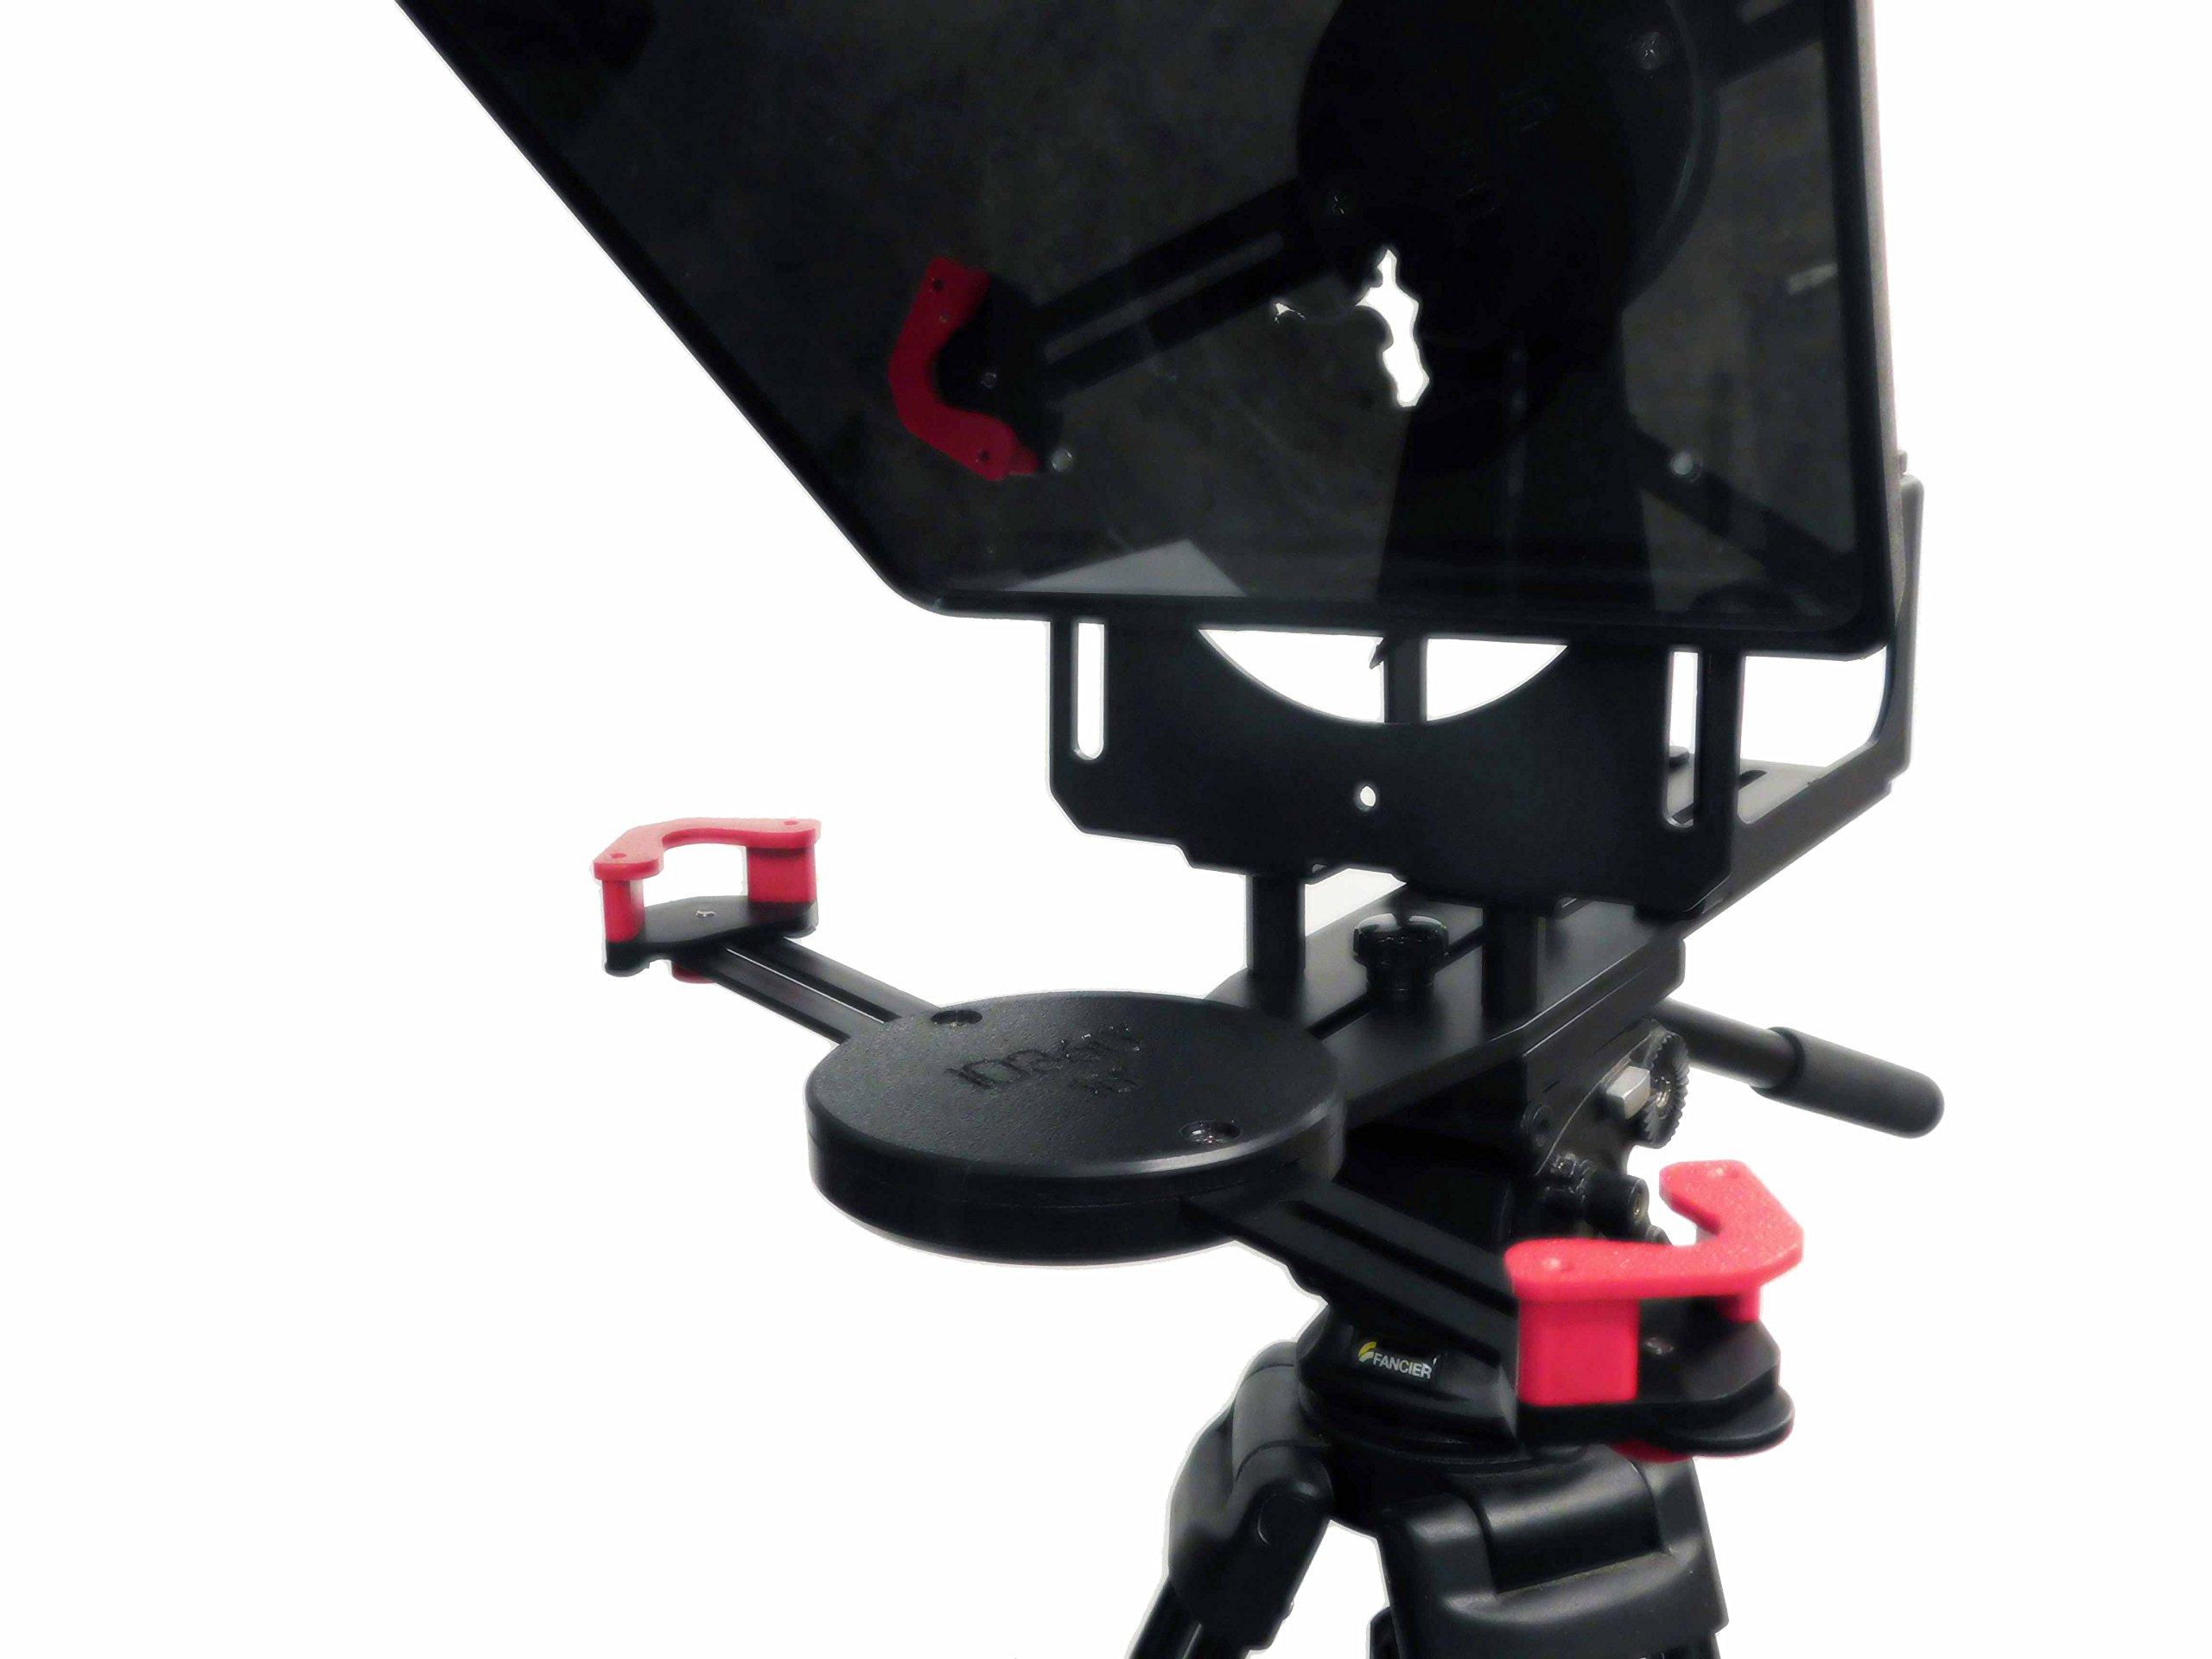 Telmax PROIPEX iPad / Android / Smartphone Universal Teleprompter by Telmax Teleprompters (Image #4)